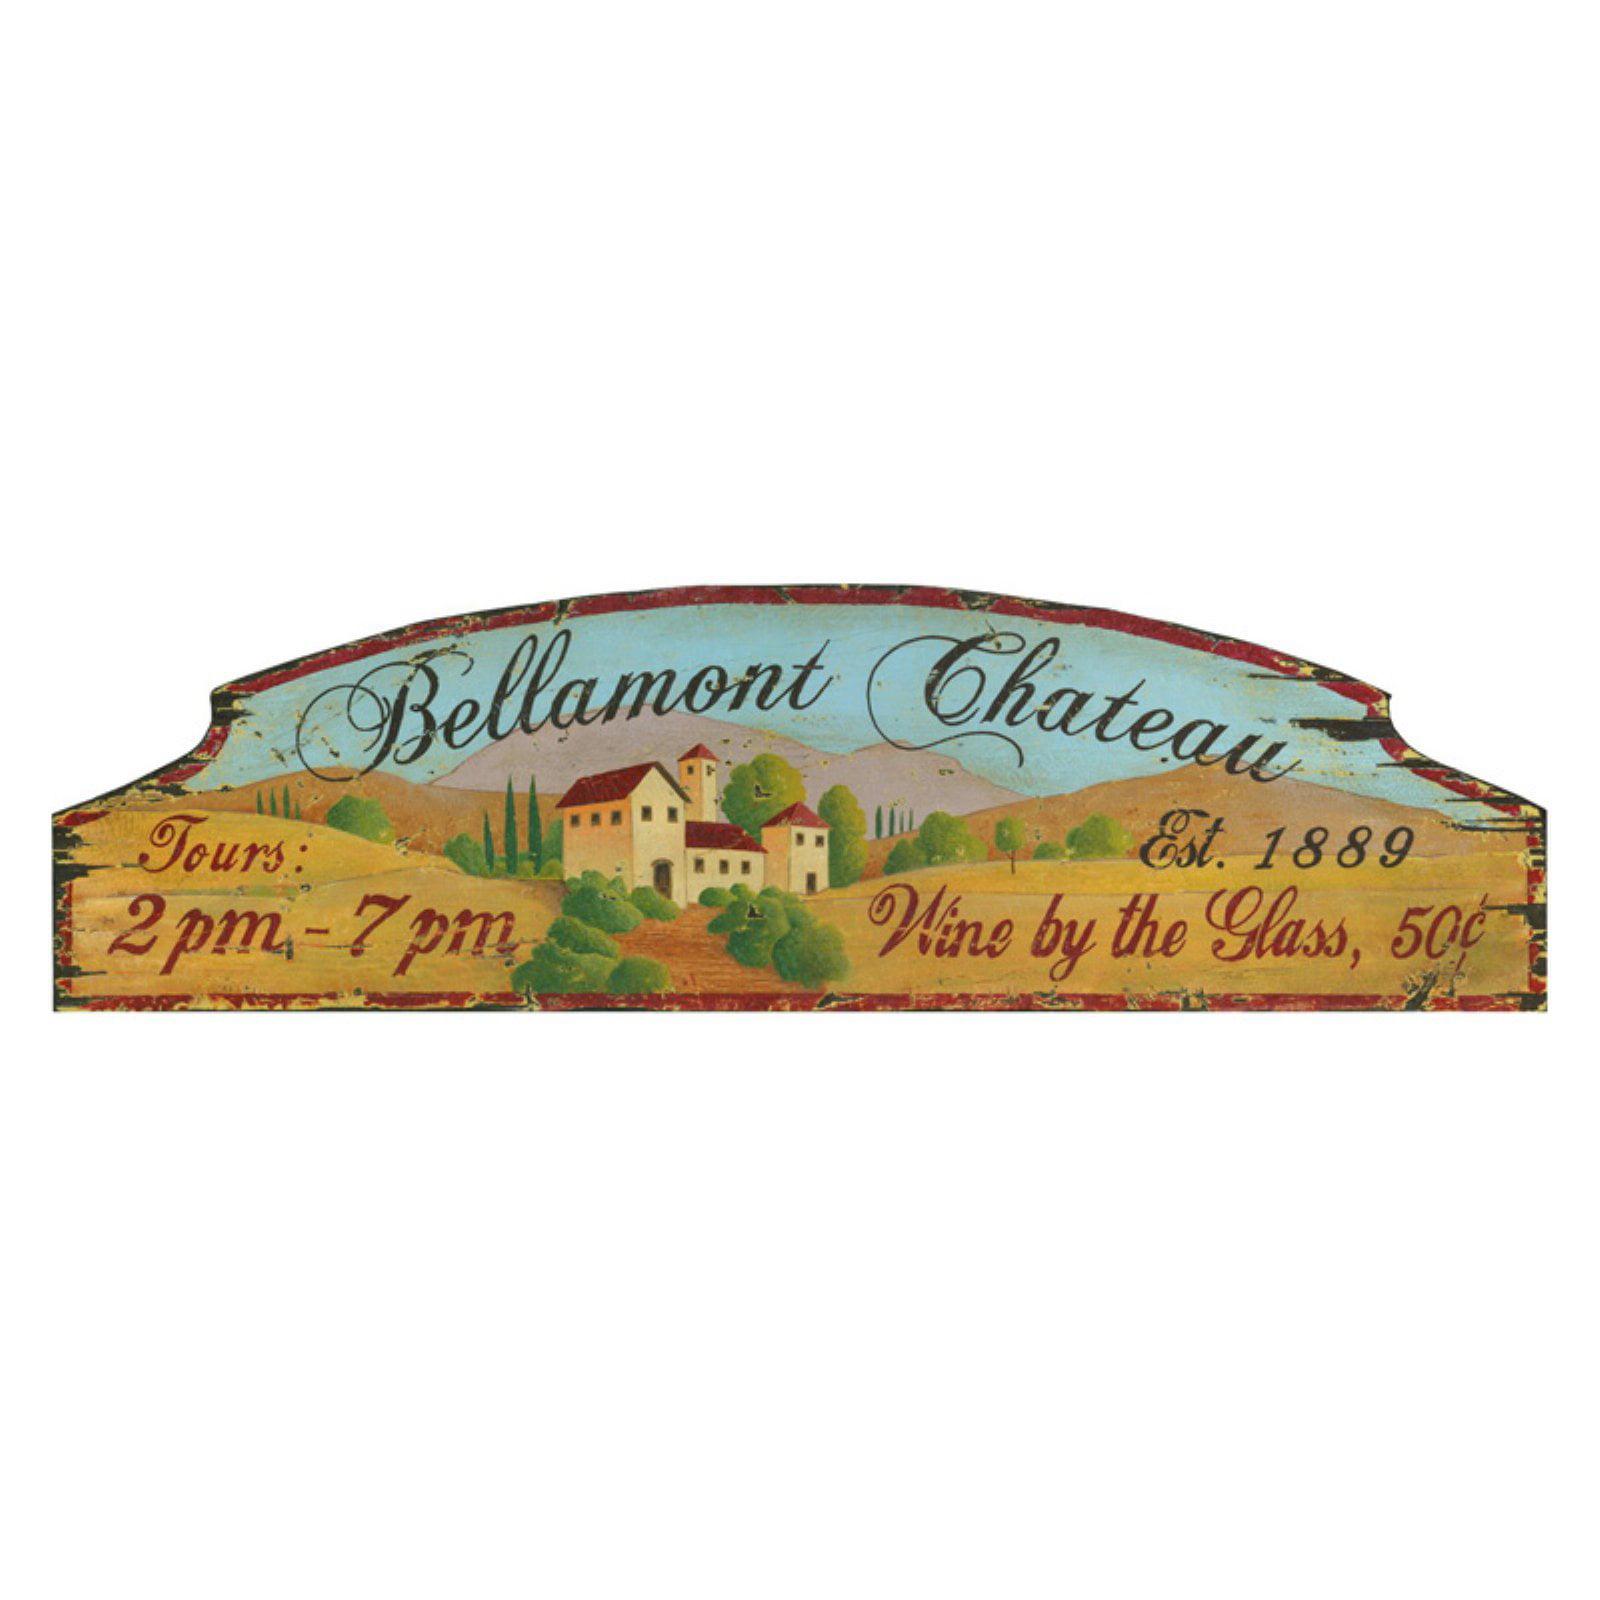 Bellamont Chateau Wall Art - 32W x 11H in.